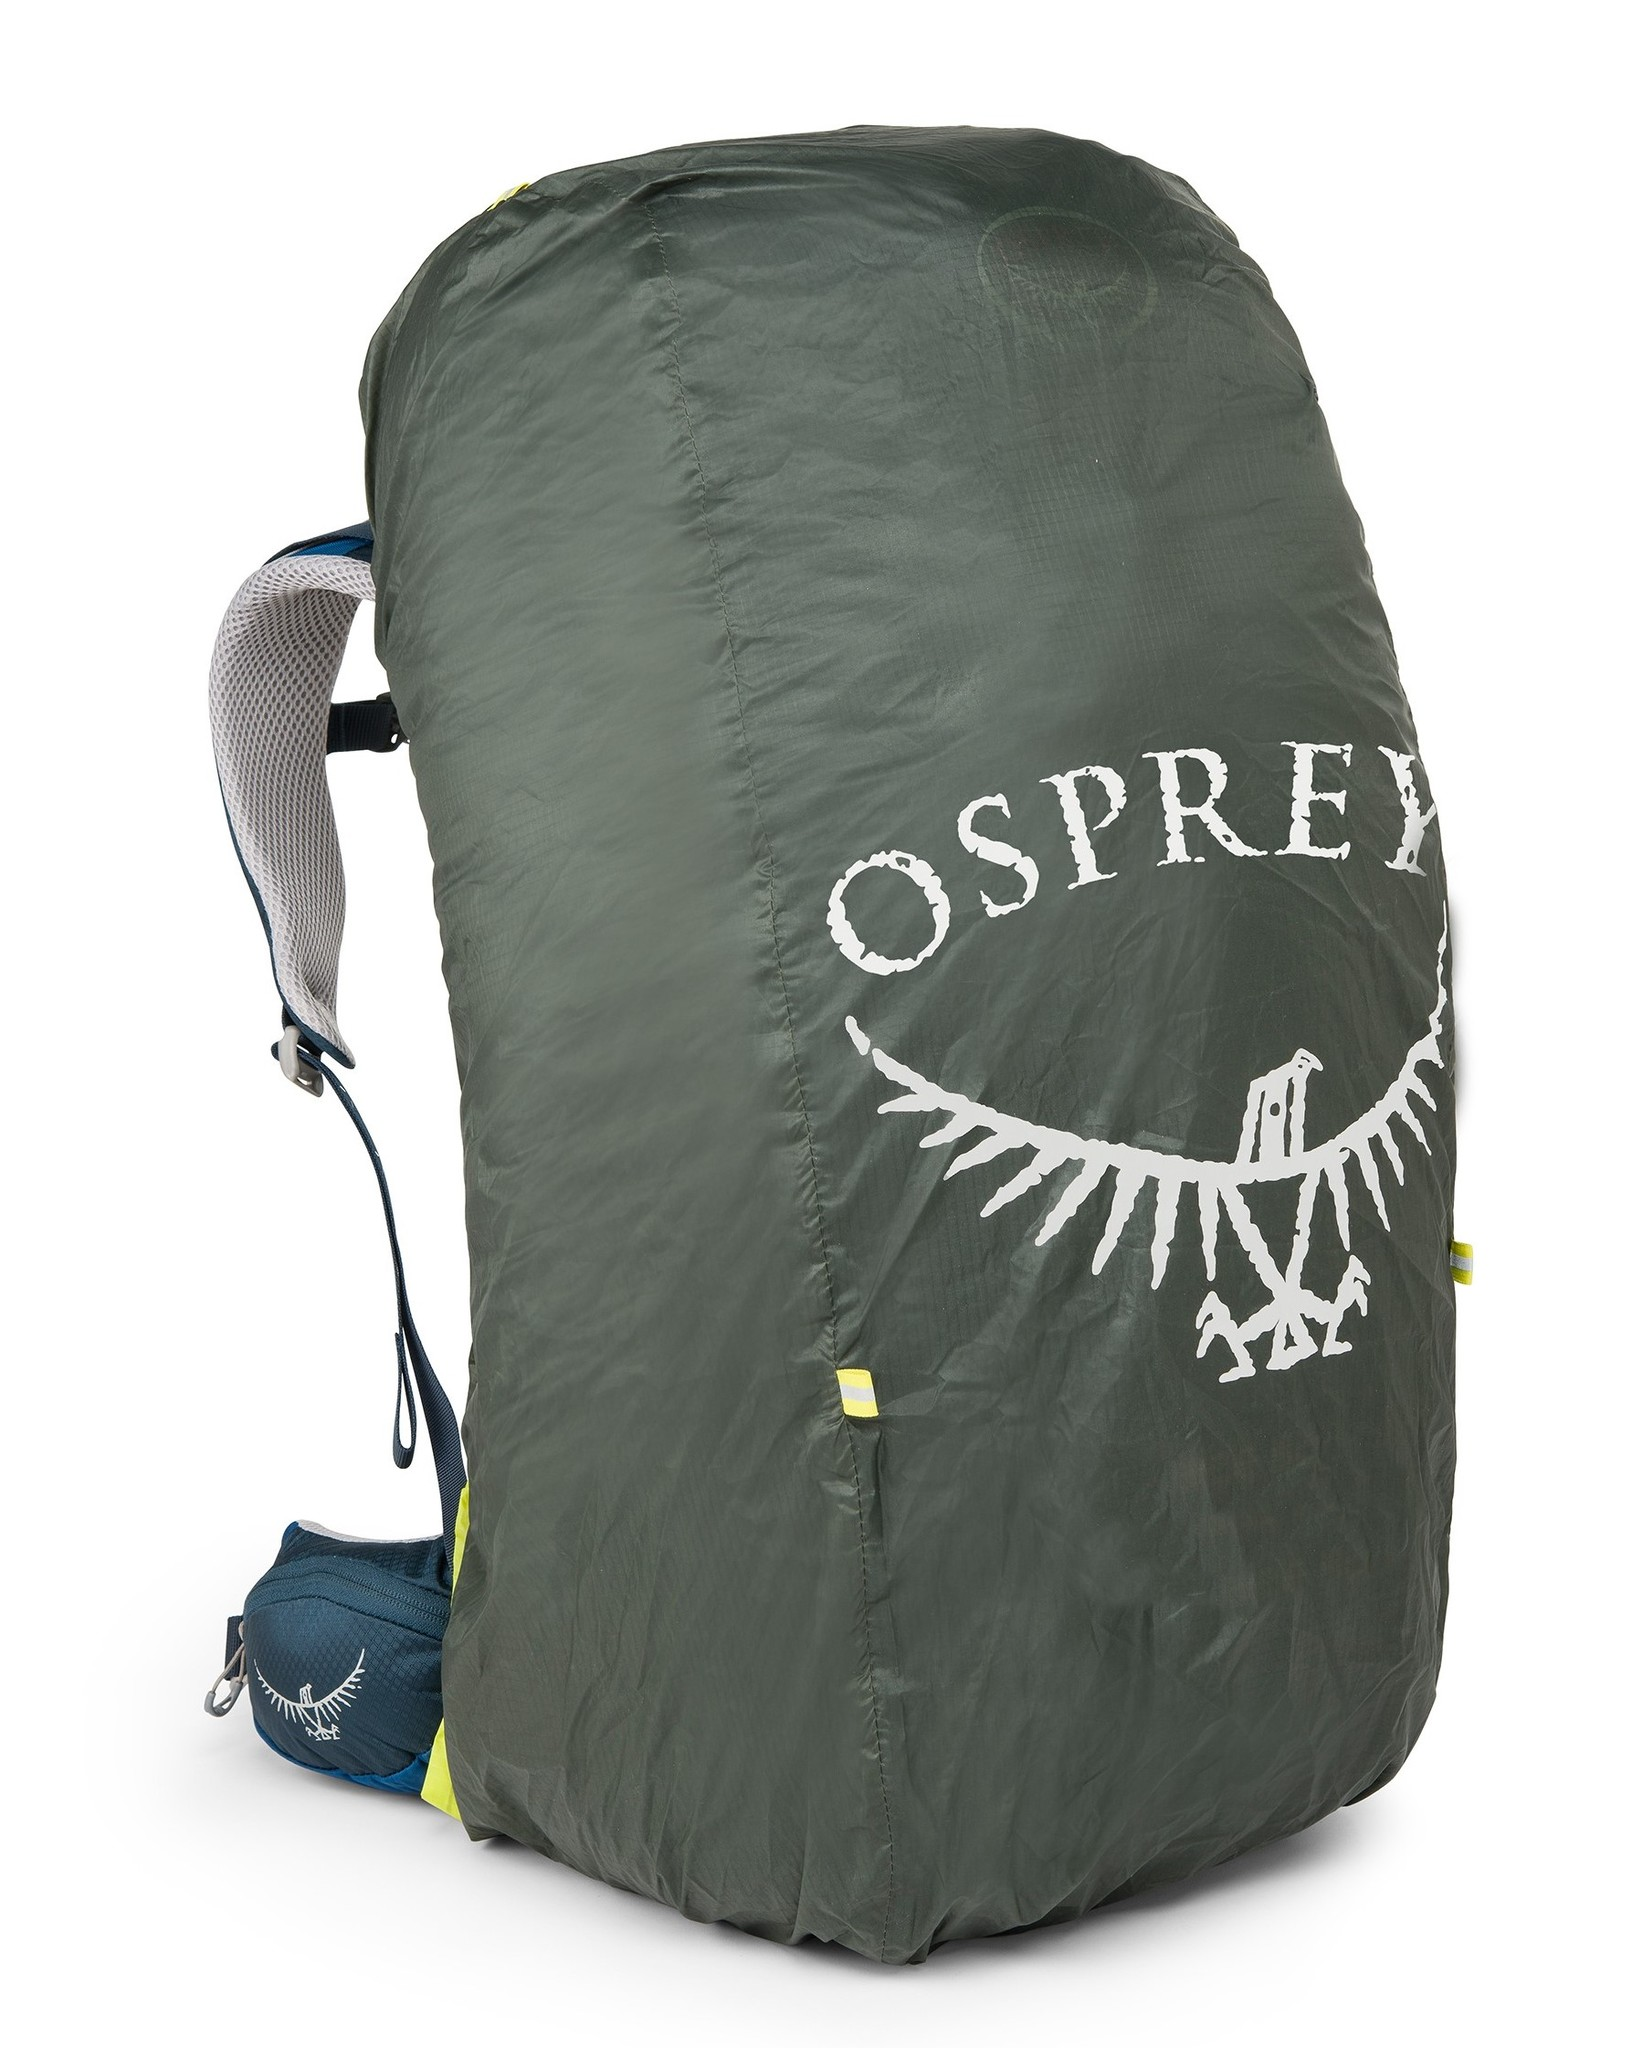 Аксессуары Чехол от дождя Osprey Ultralight Raincover XL (75-110 литров) ultralight_raincover_web_7.jpg